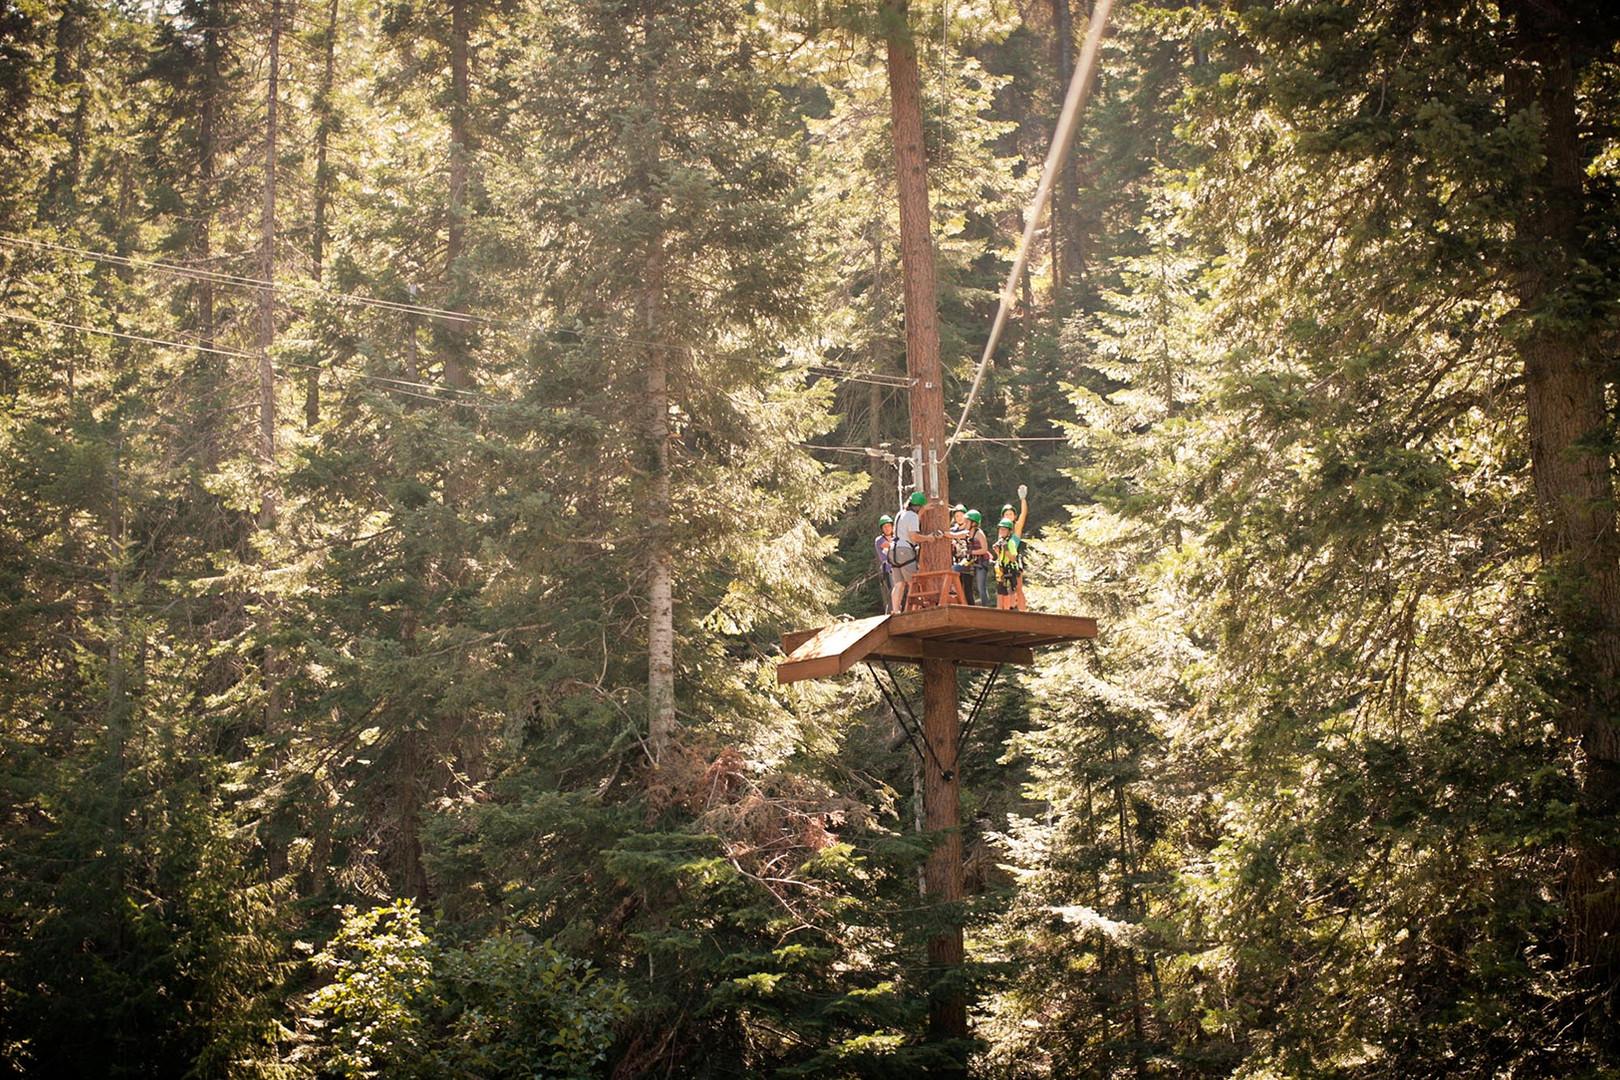 High Zipline Platform